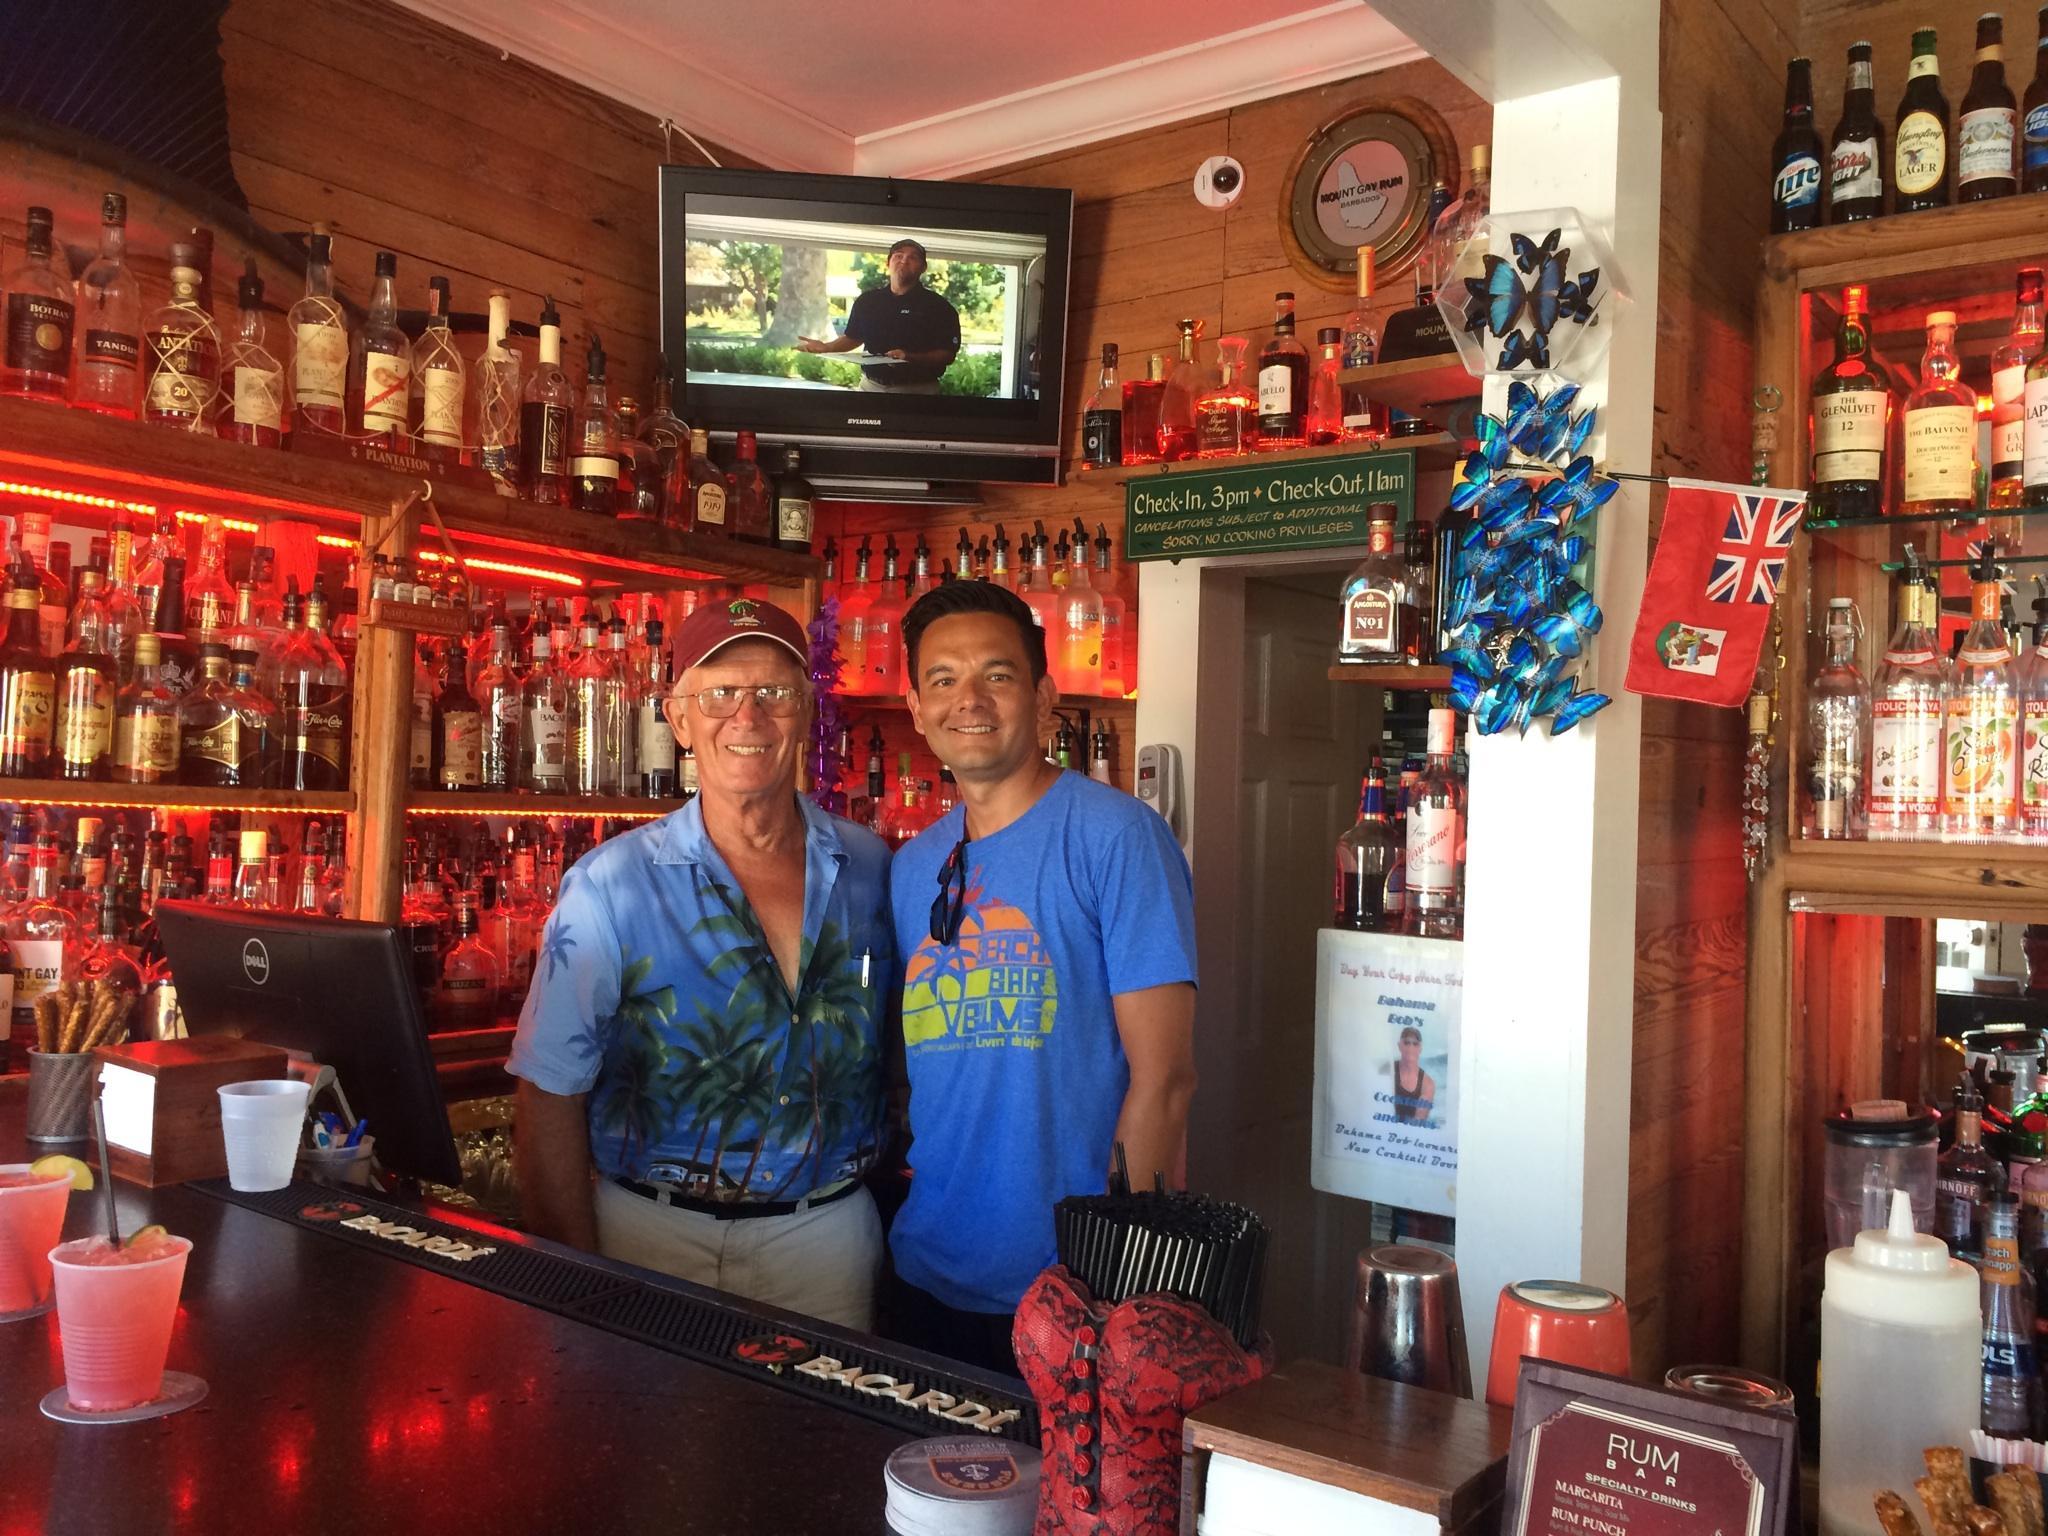 Meeting Bahama Bob Leonard at the Rum Bar at the Speakeasy Inn in Key West, Florida.